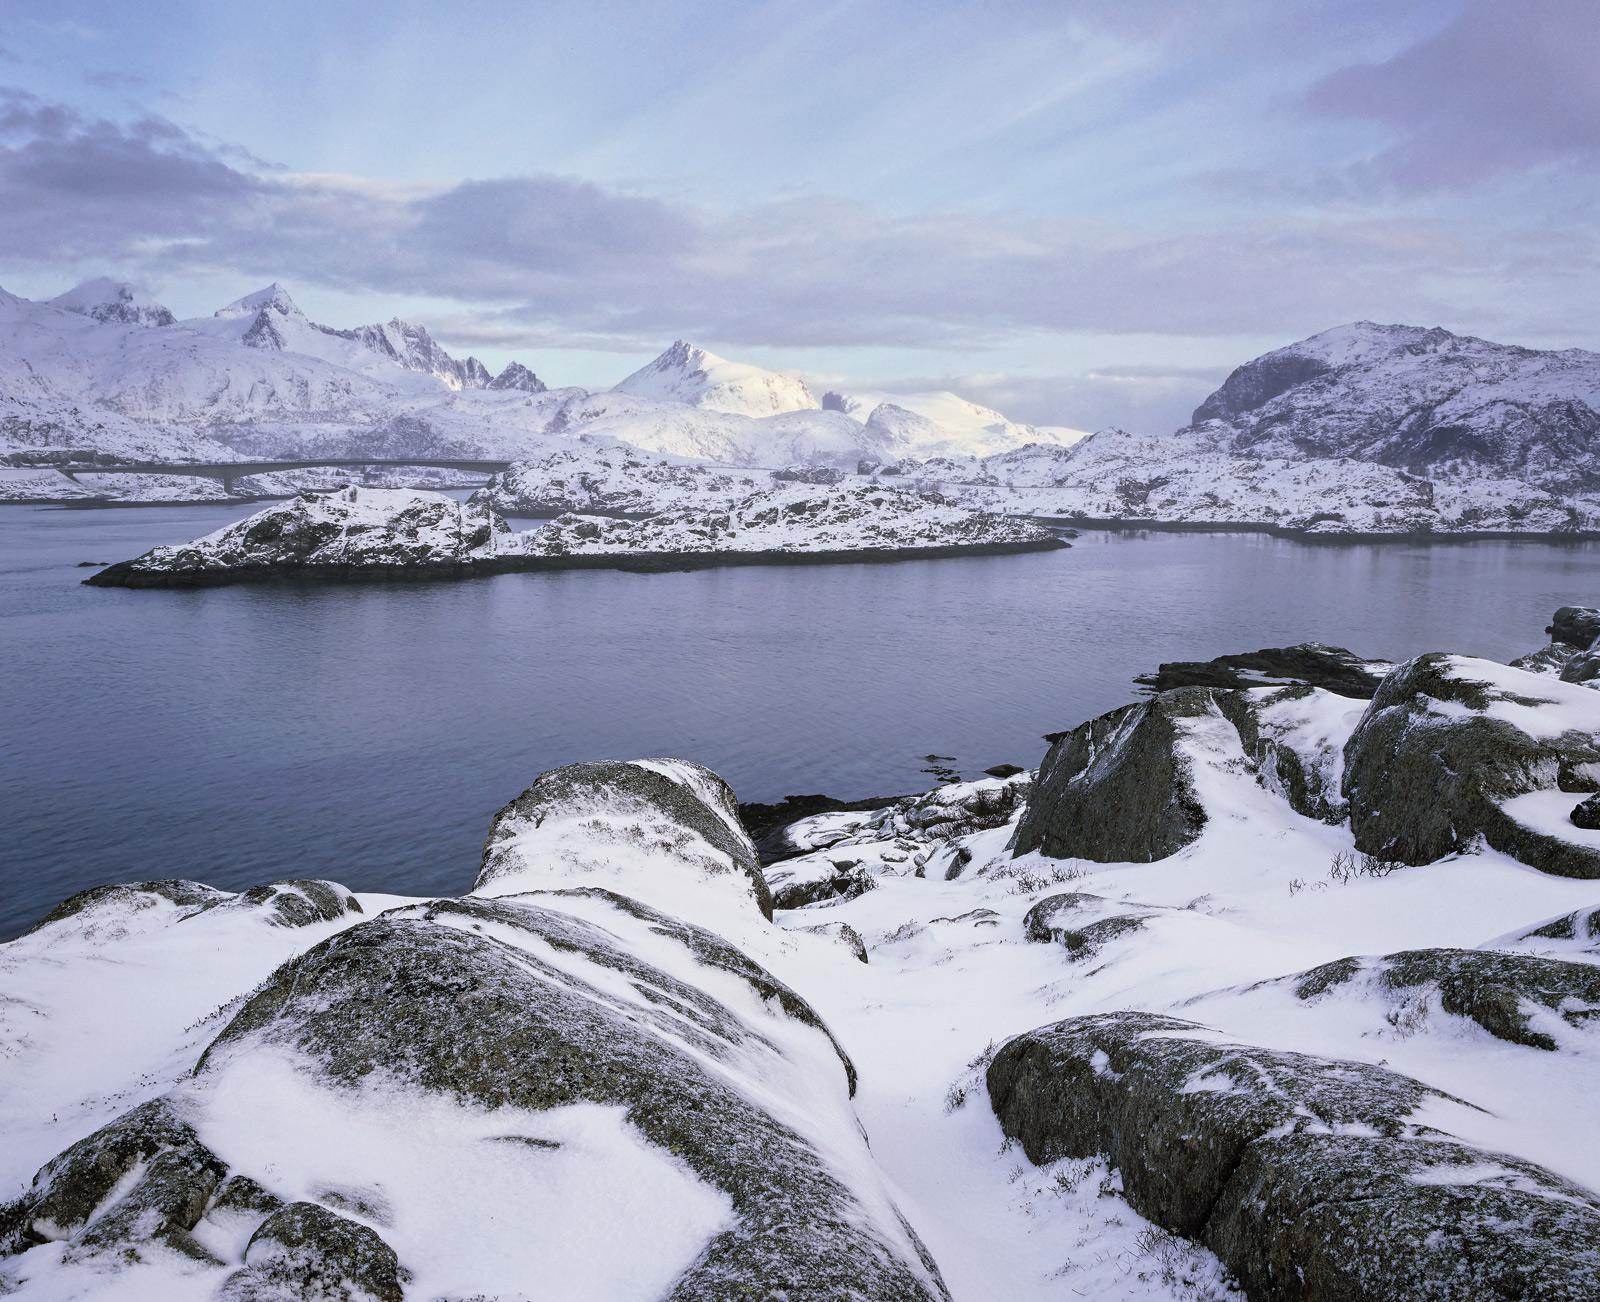 Sound Of Sund, Sund, Lofoten, Norway, beautiful, sunrise, soft, snow, delicate, misty, weather, sunlit, peaks, ethereal, photo